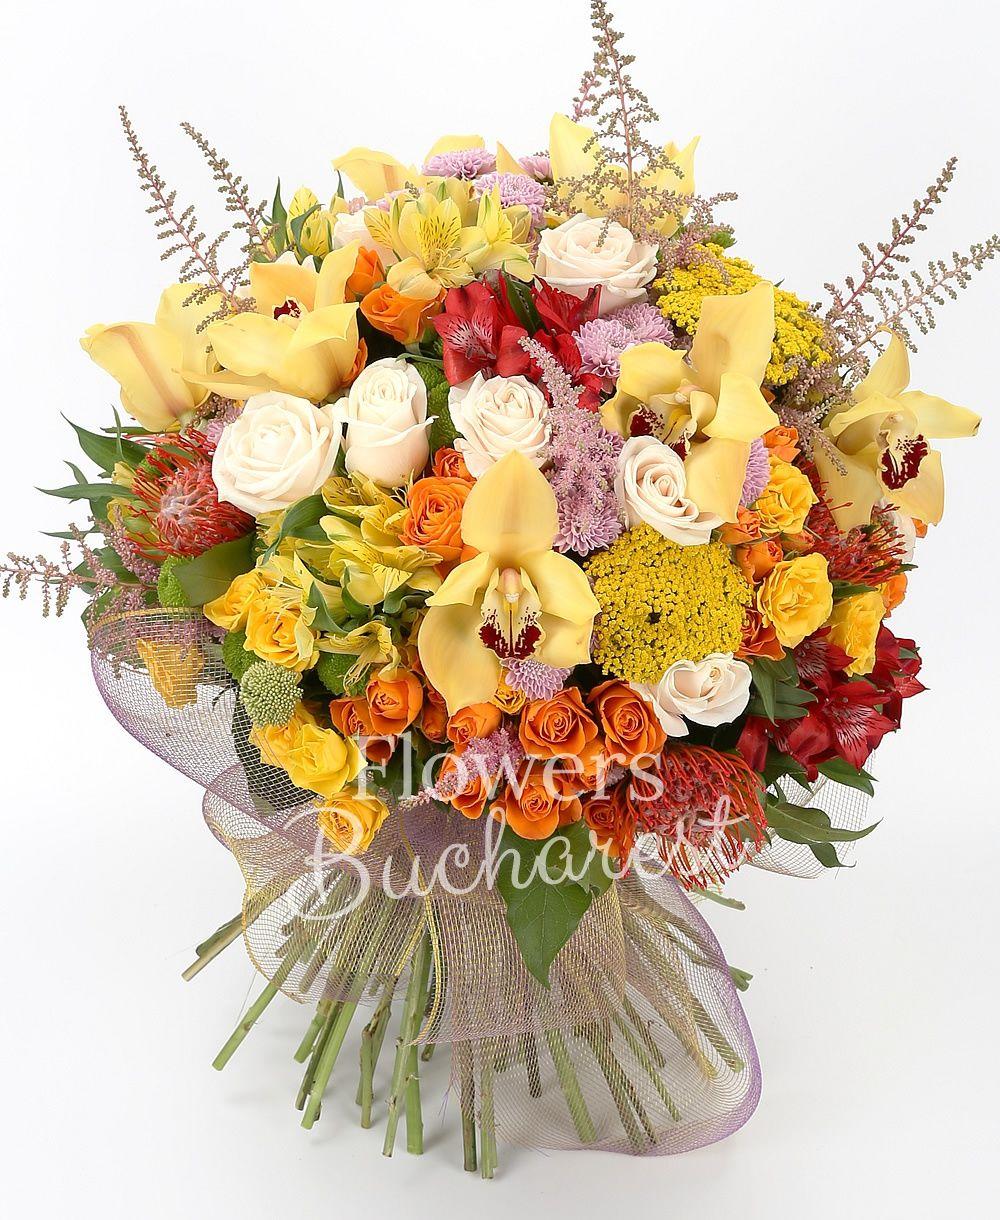 9 cream roses, 5 orange miniroses, 5 yellow miniroses, 5 yellow alstroemeria, 5 red alstroemeria, 5 leucospermum, 3 pink santini, 3 green santini, 7 pink astilbe, 5 yellow rice flower, yellow cymbidium